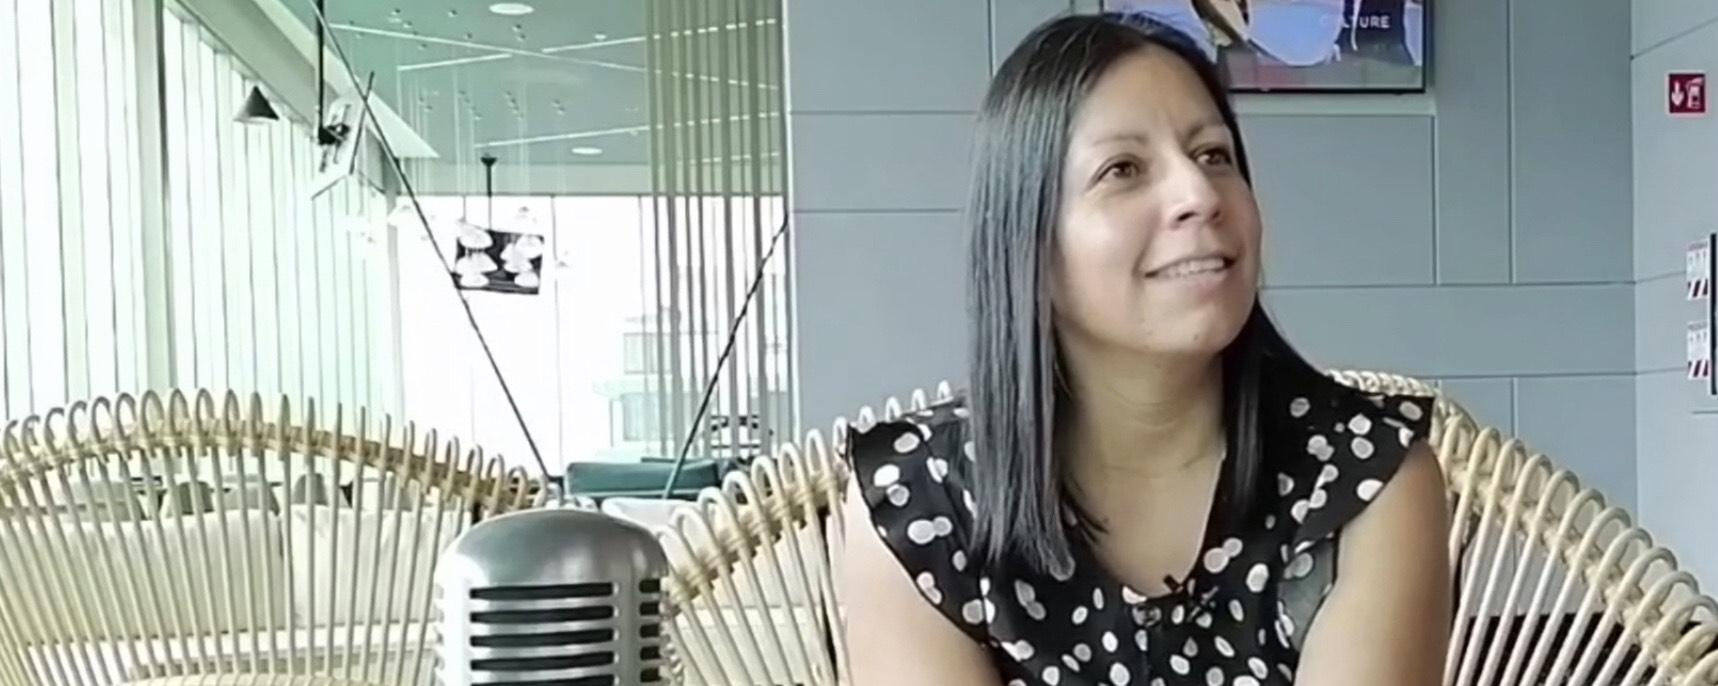 Los Guerrer@s: Olga Rincón – Agencia Maxatho